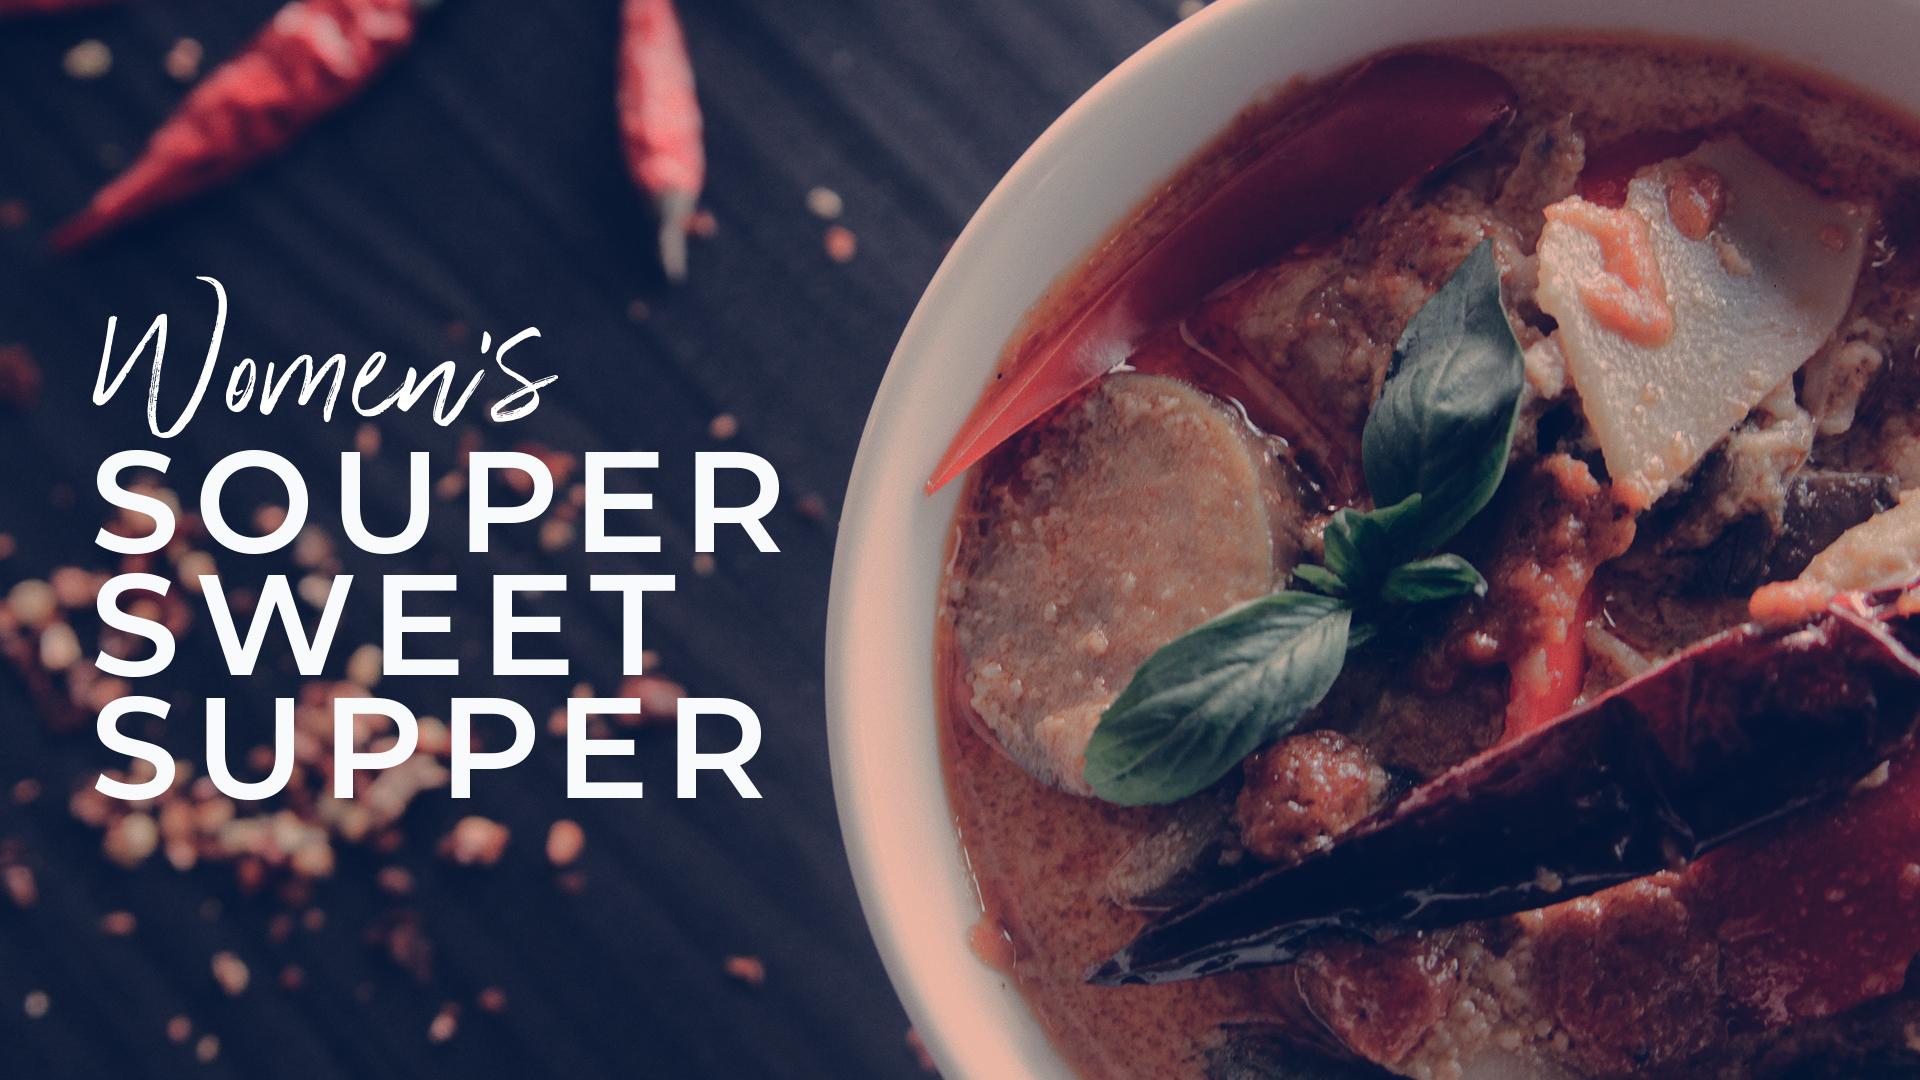 011519_Womens Supper_WEB.jpg